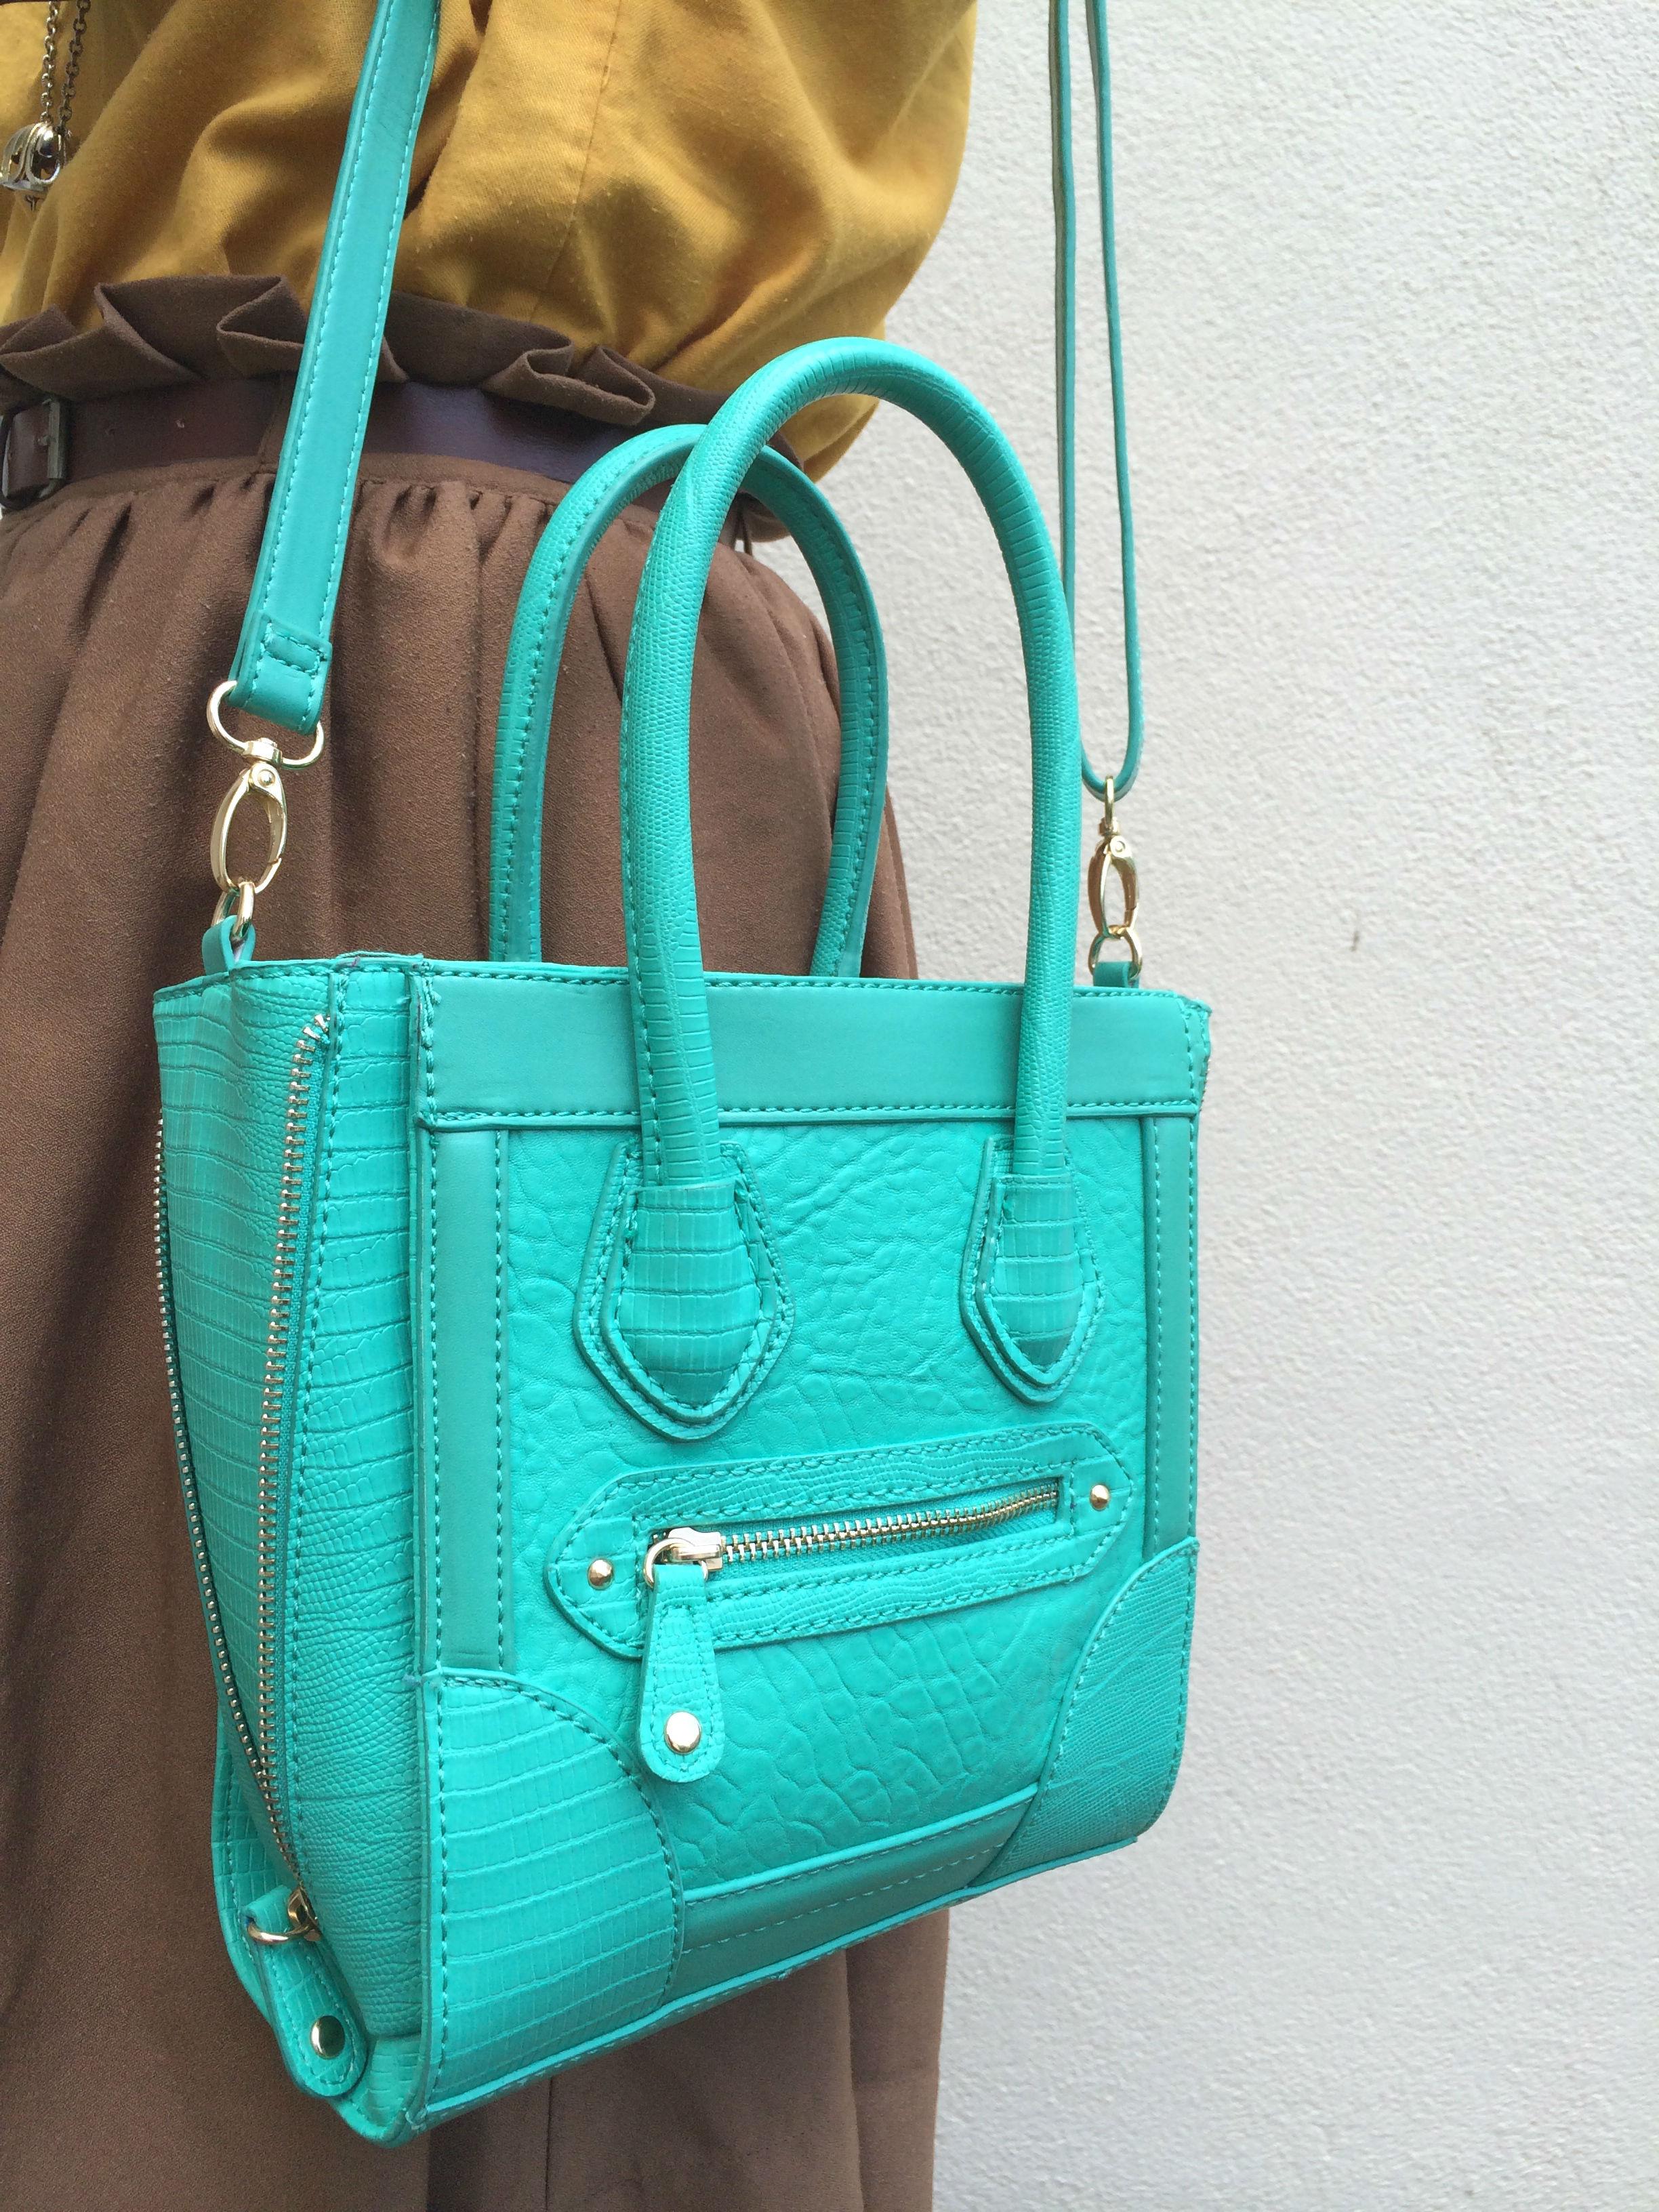 minature-satchel-purse.jpg